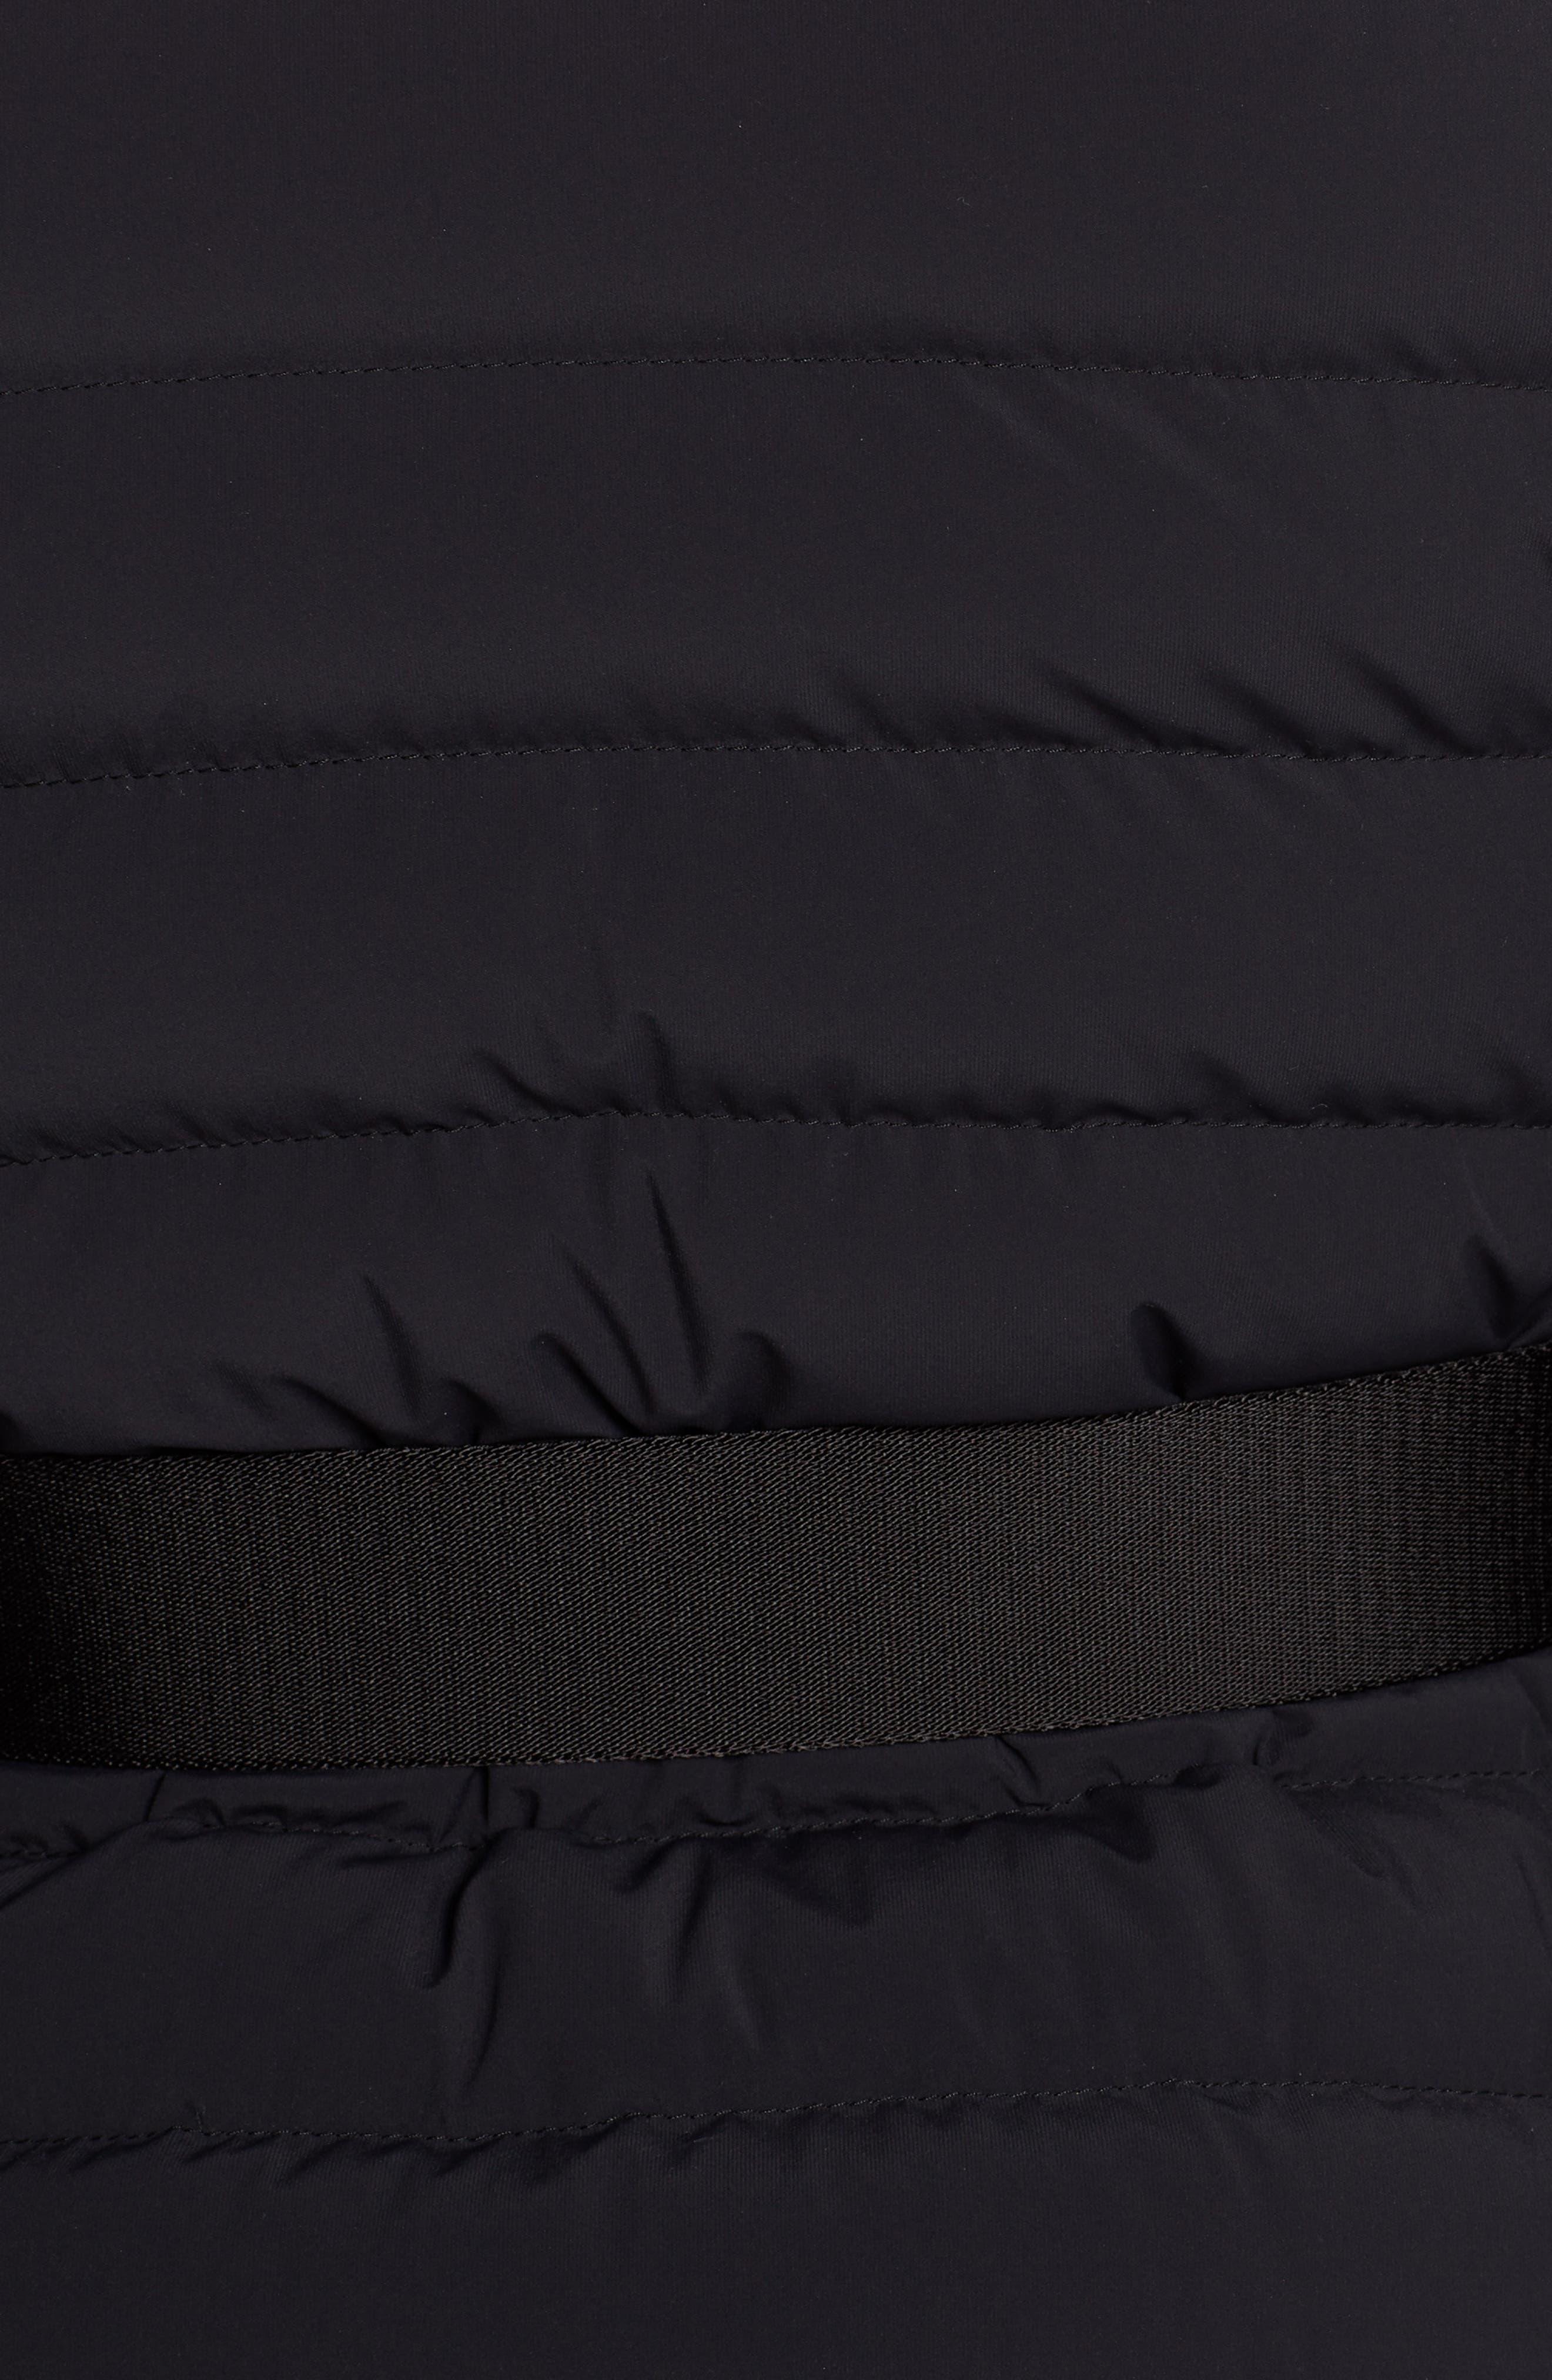 Moncler Coats Bruche Belted Down Puffer Ski Jacket